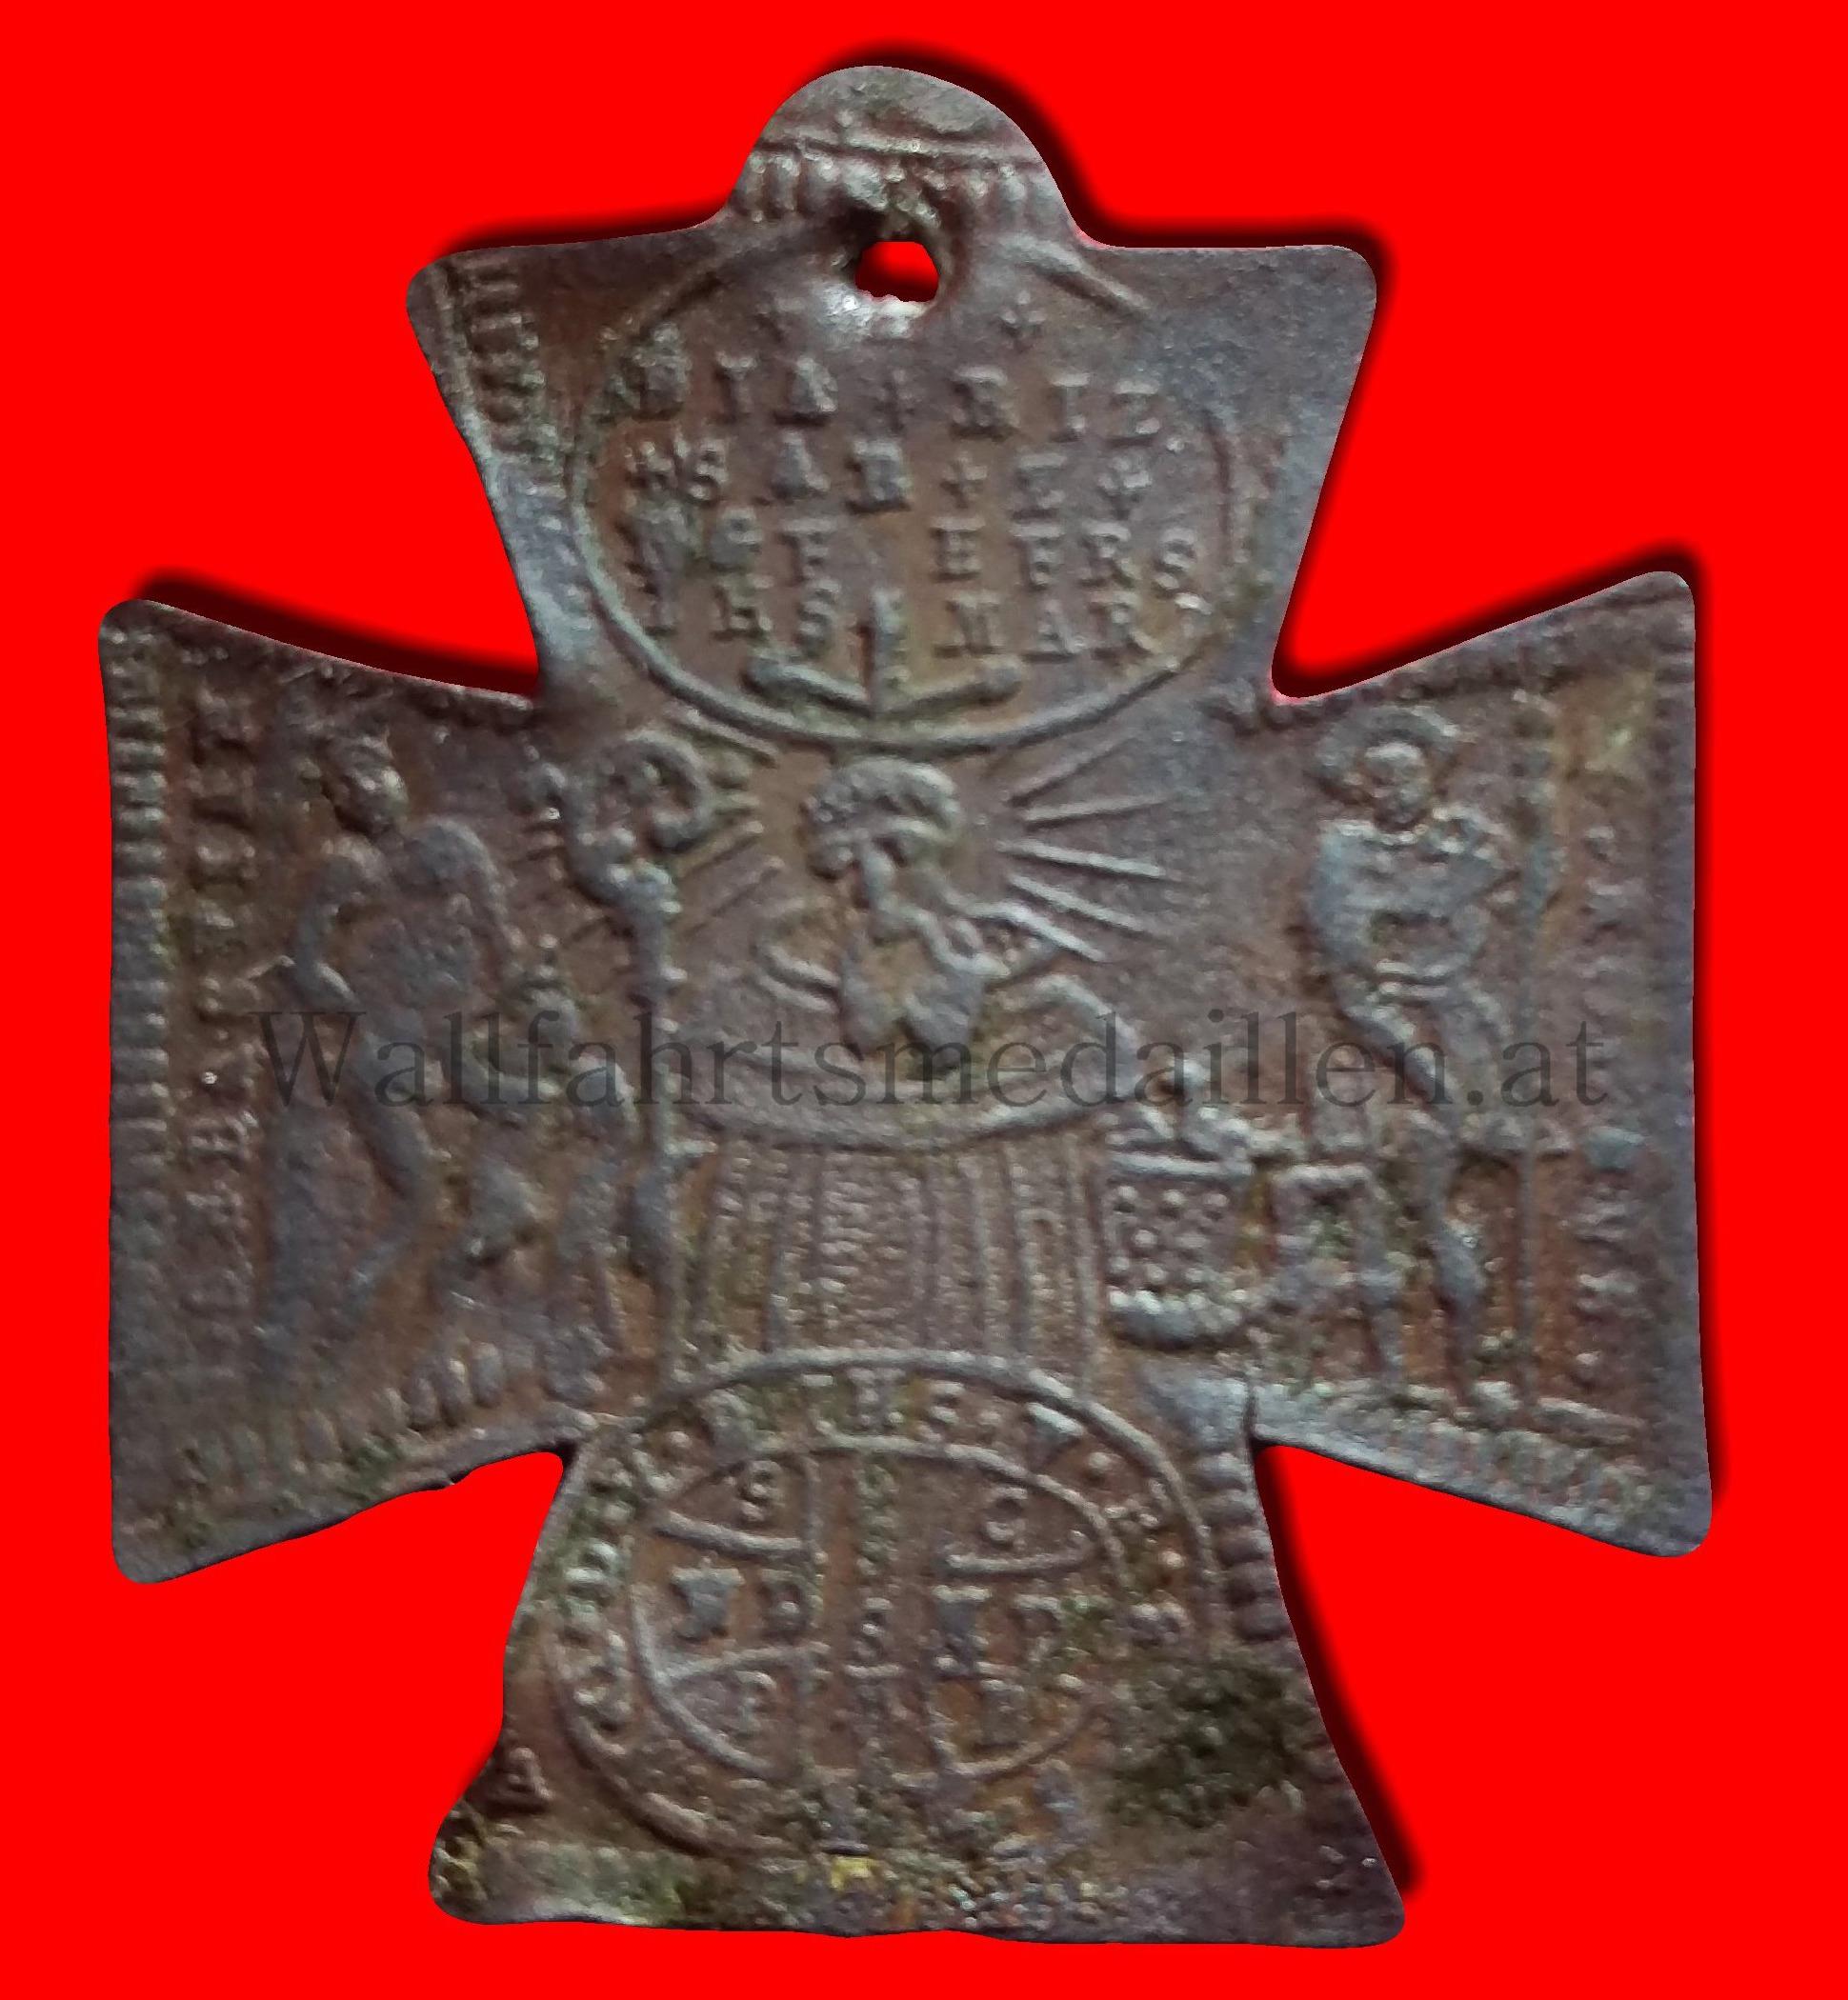 Dreikönigskreuz